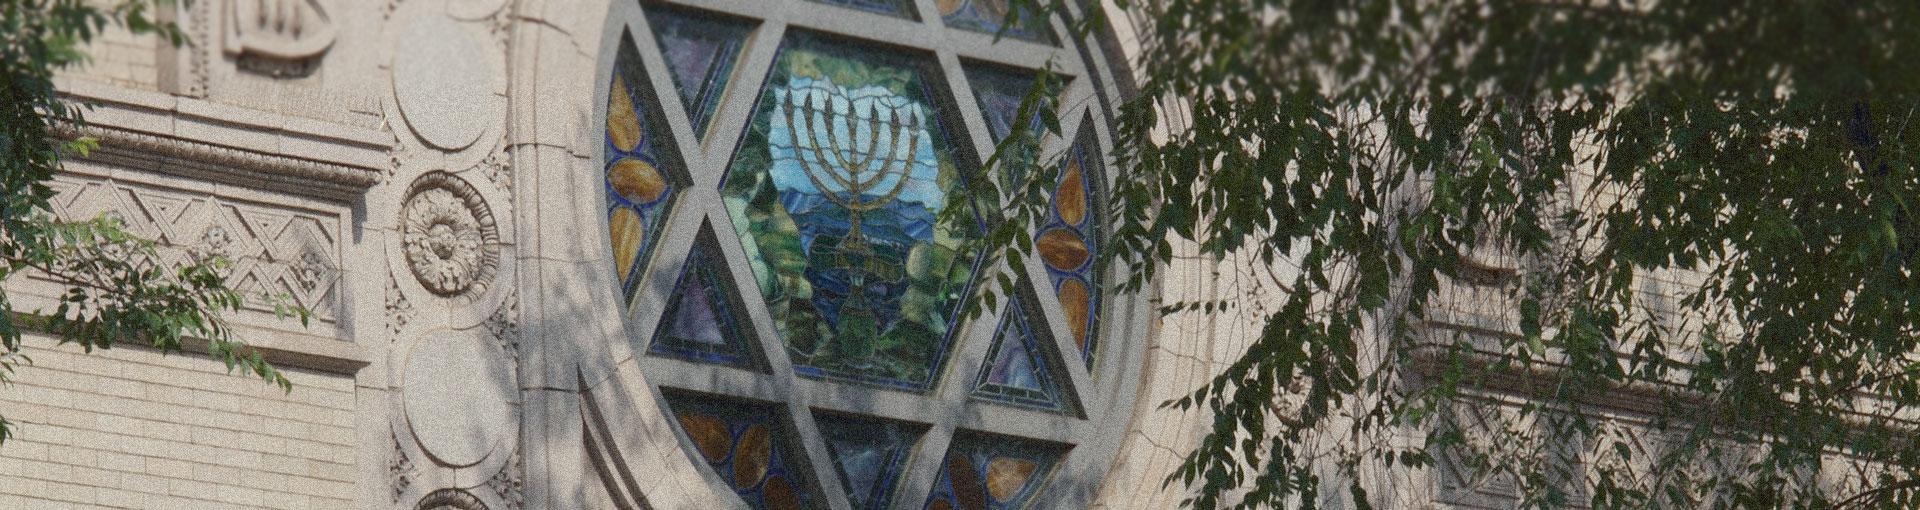 SixthandI-Synagogueblurgrain